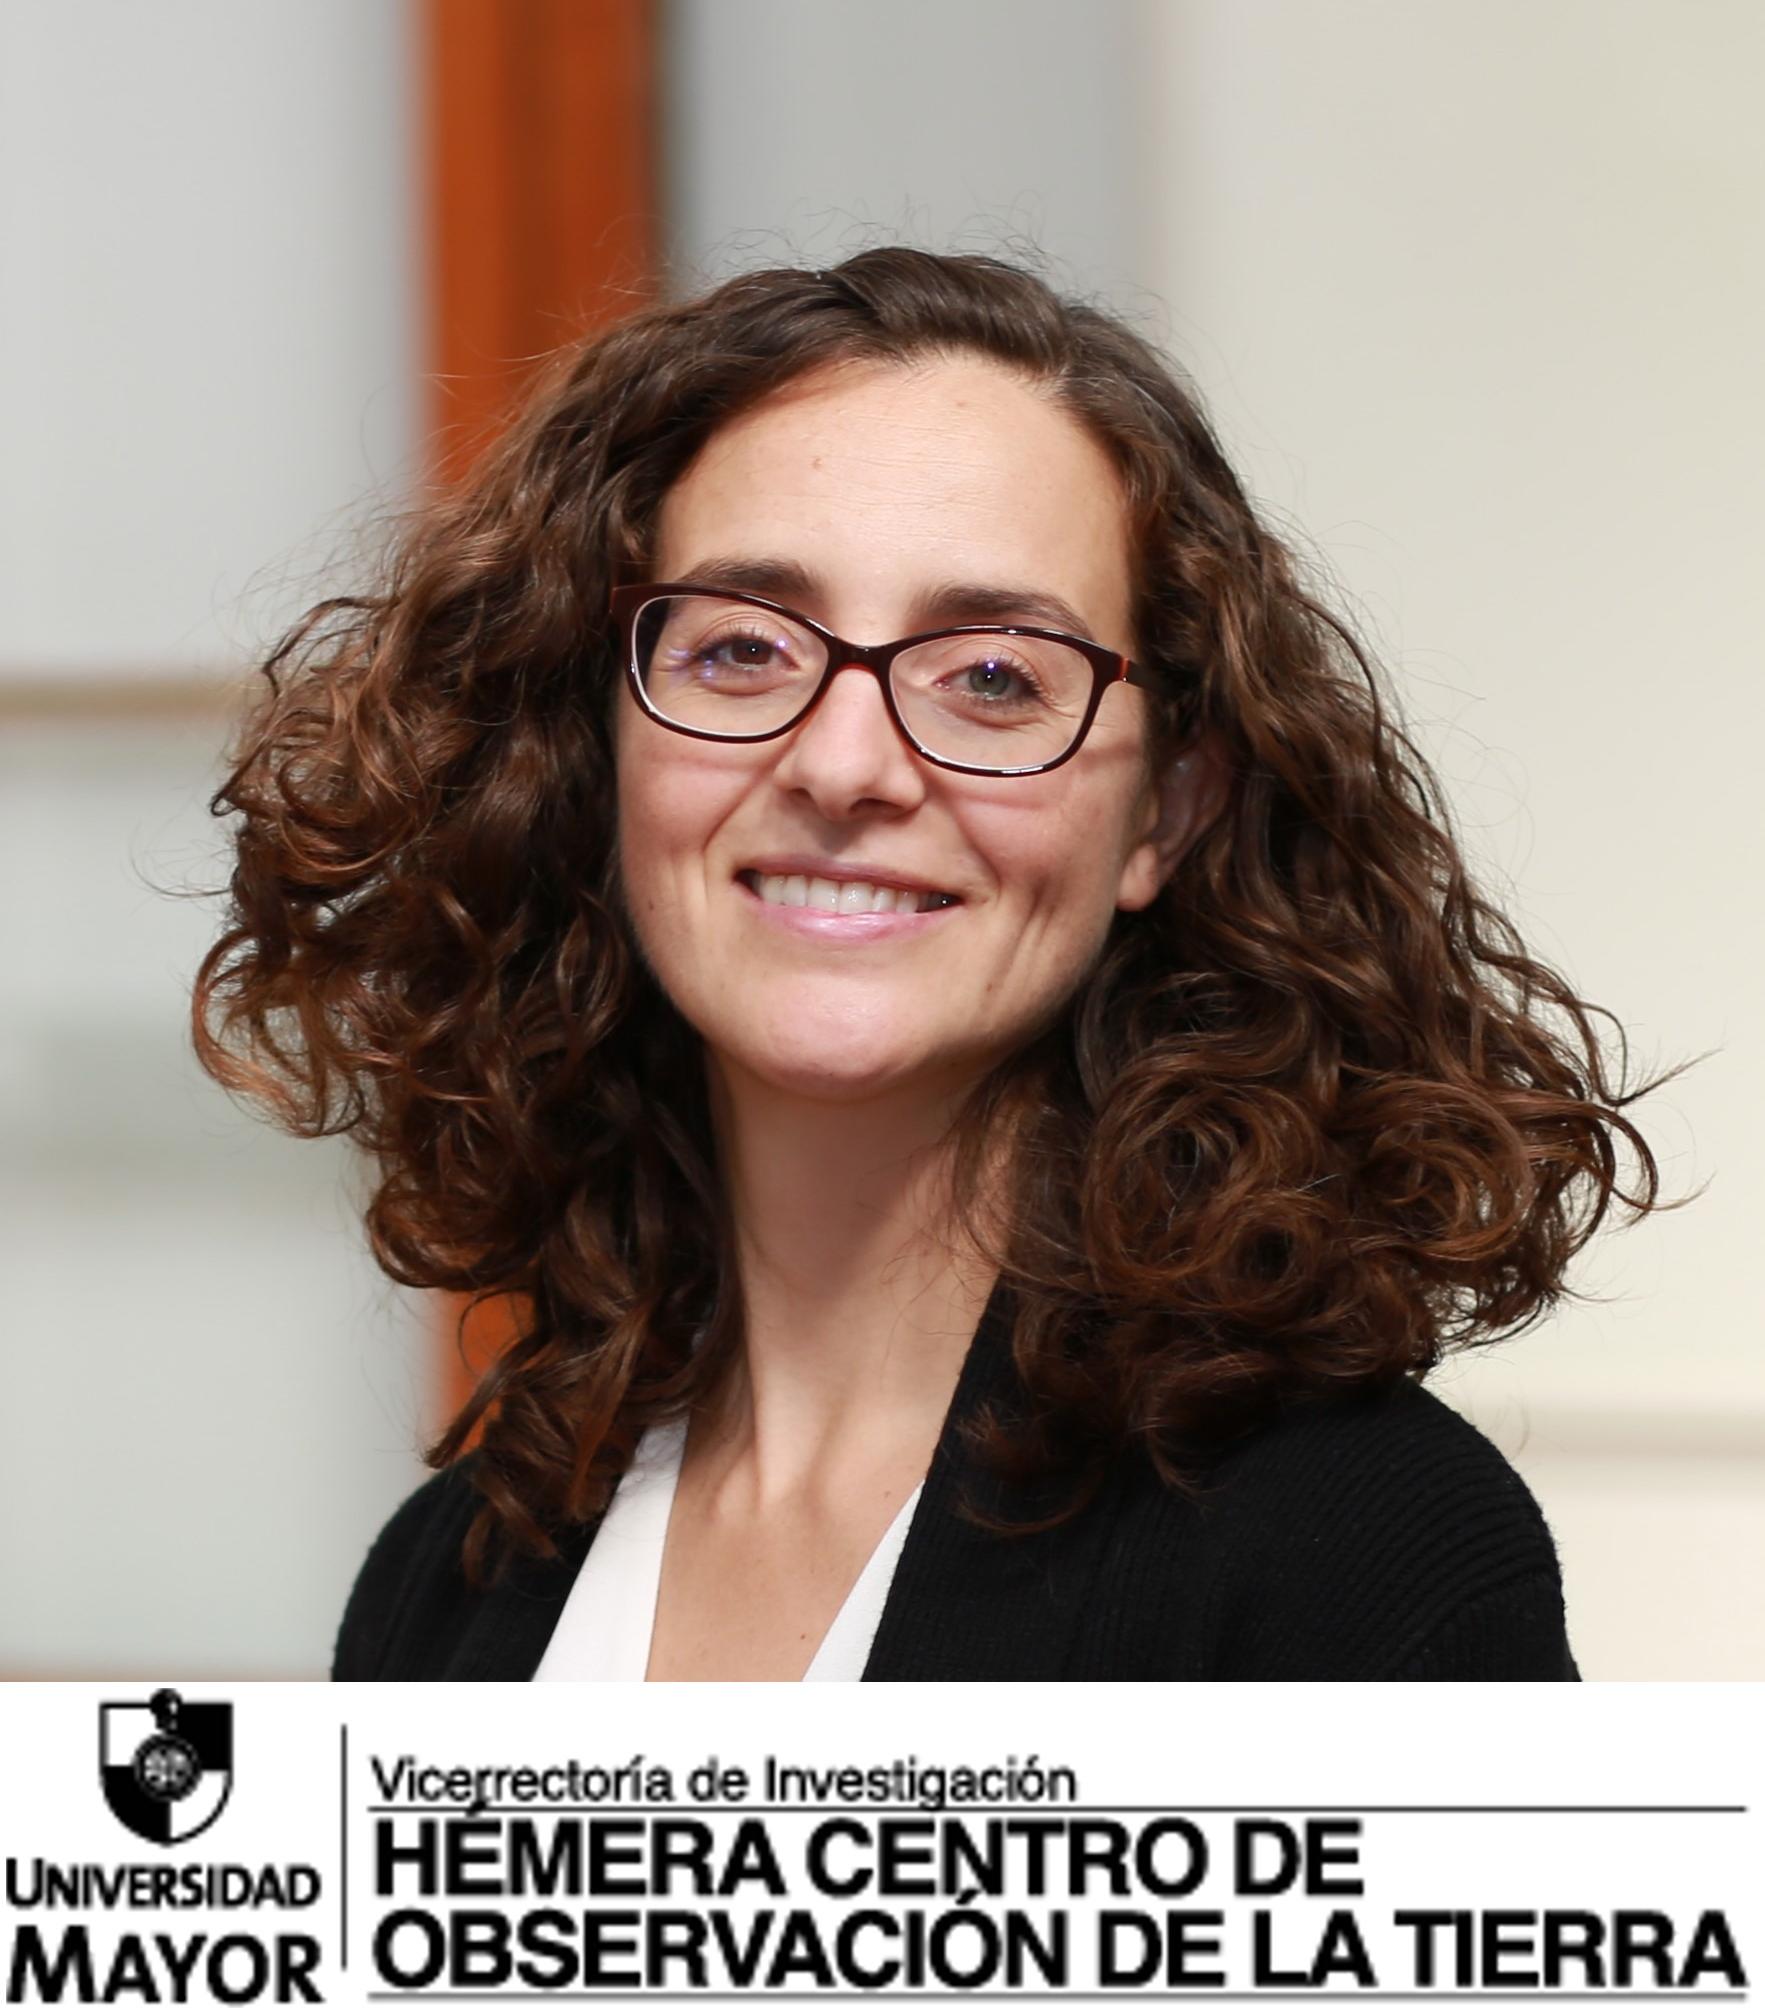 Dr. Patricia Oliva Pavón